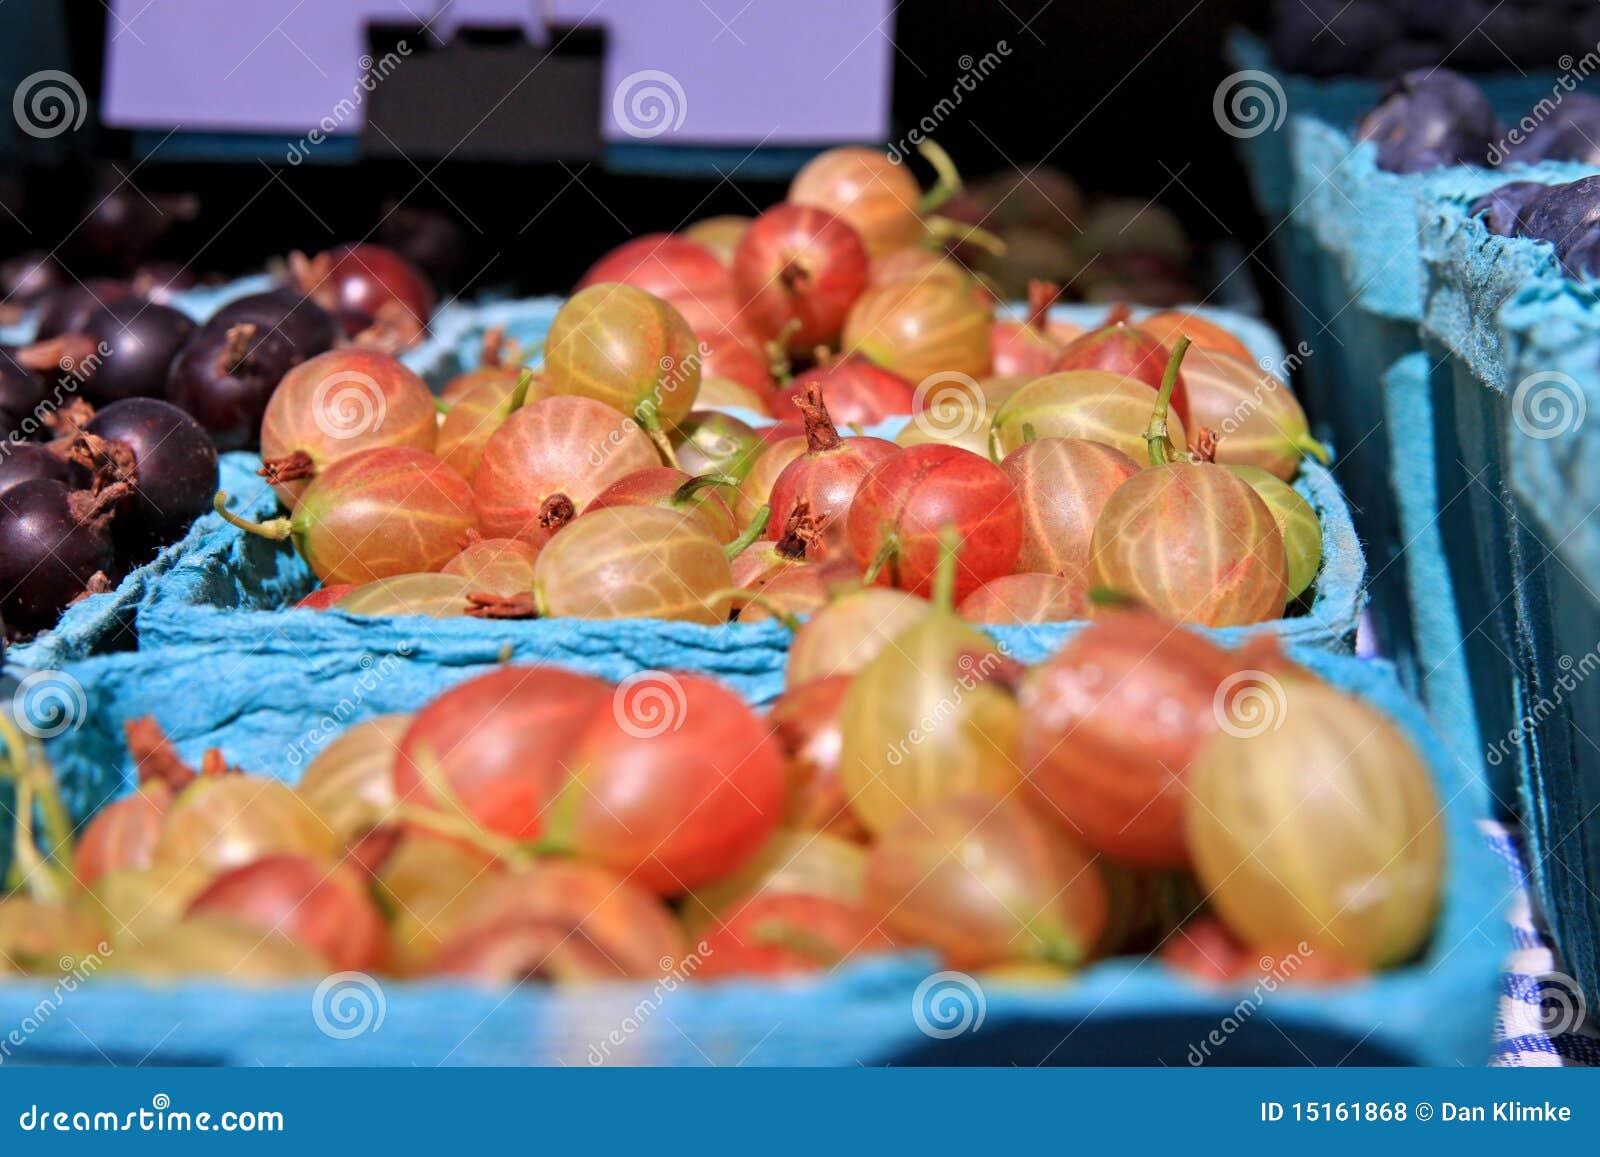 Gooseberries Fresh Food Market Images